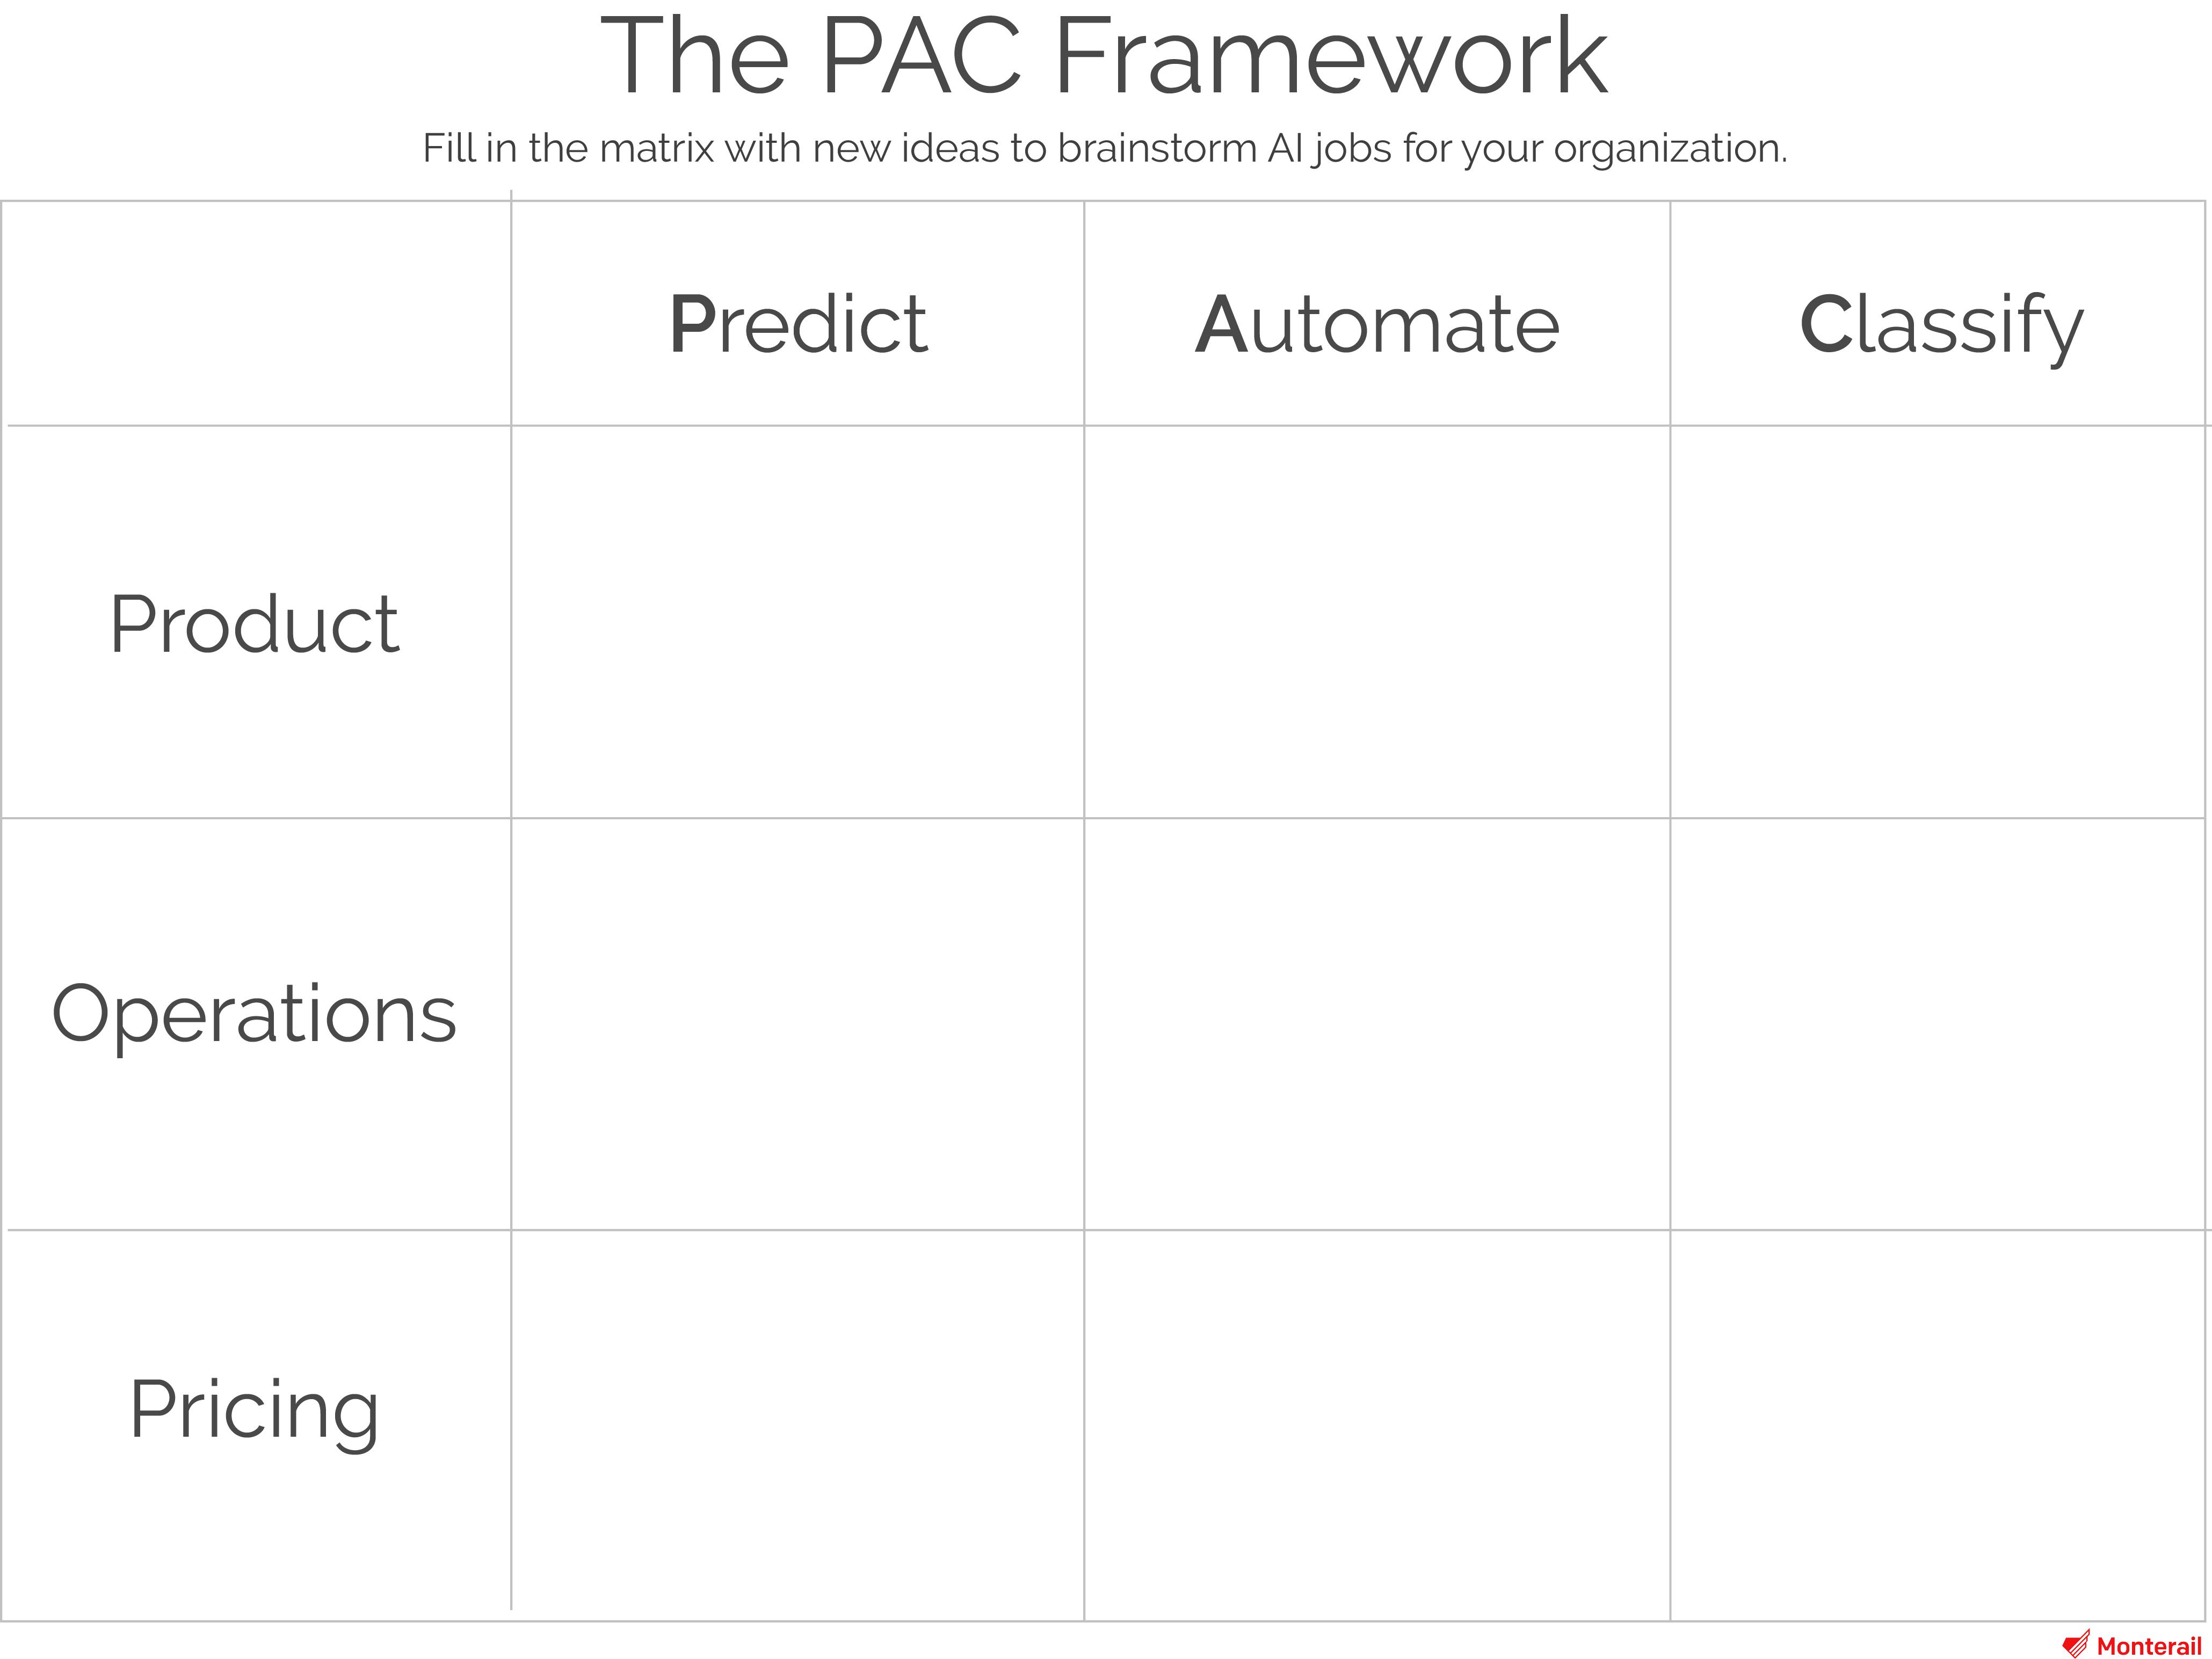 PAC framework-1.png